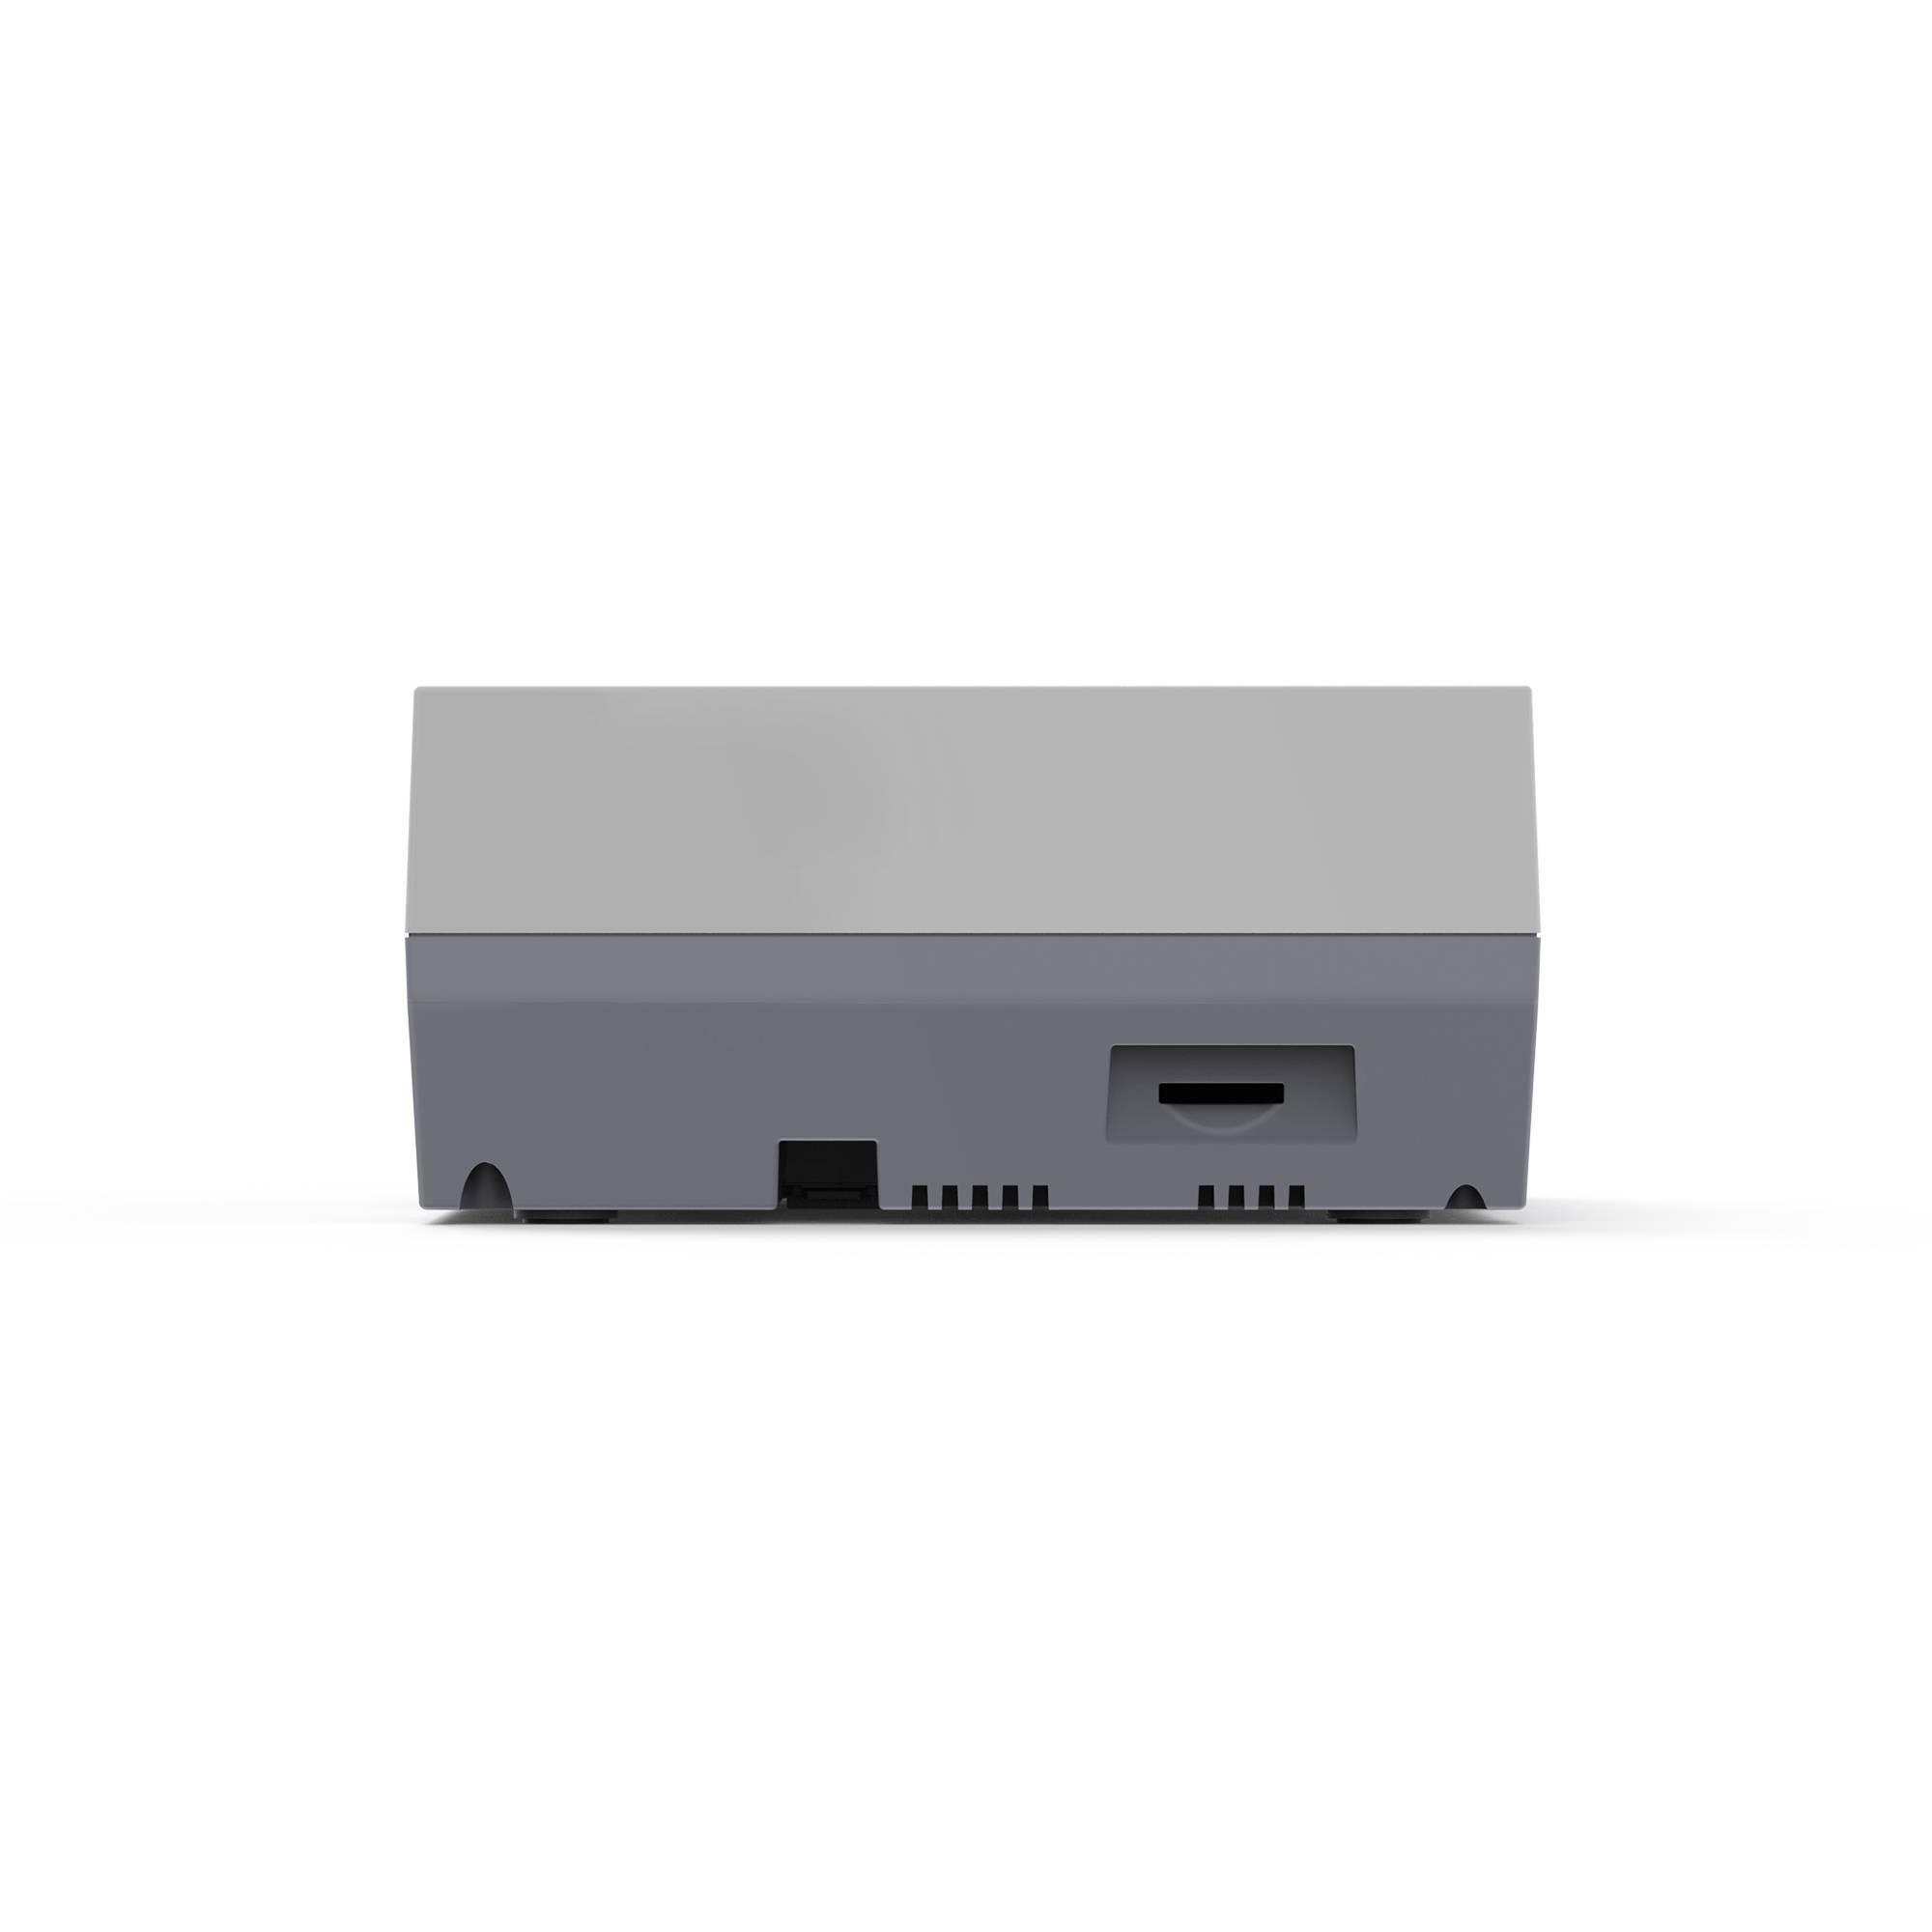 RETROFLAG NESPi 4 DIY Starting Kit for RetroPie Home Console - Showing the NESPi 4 from the side